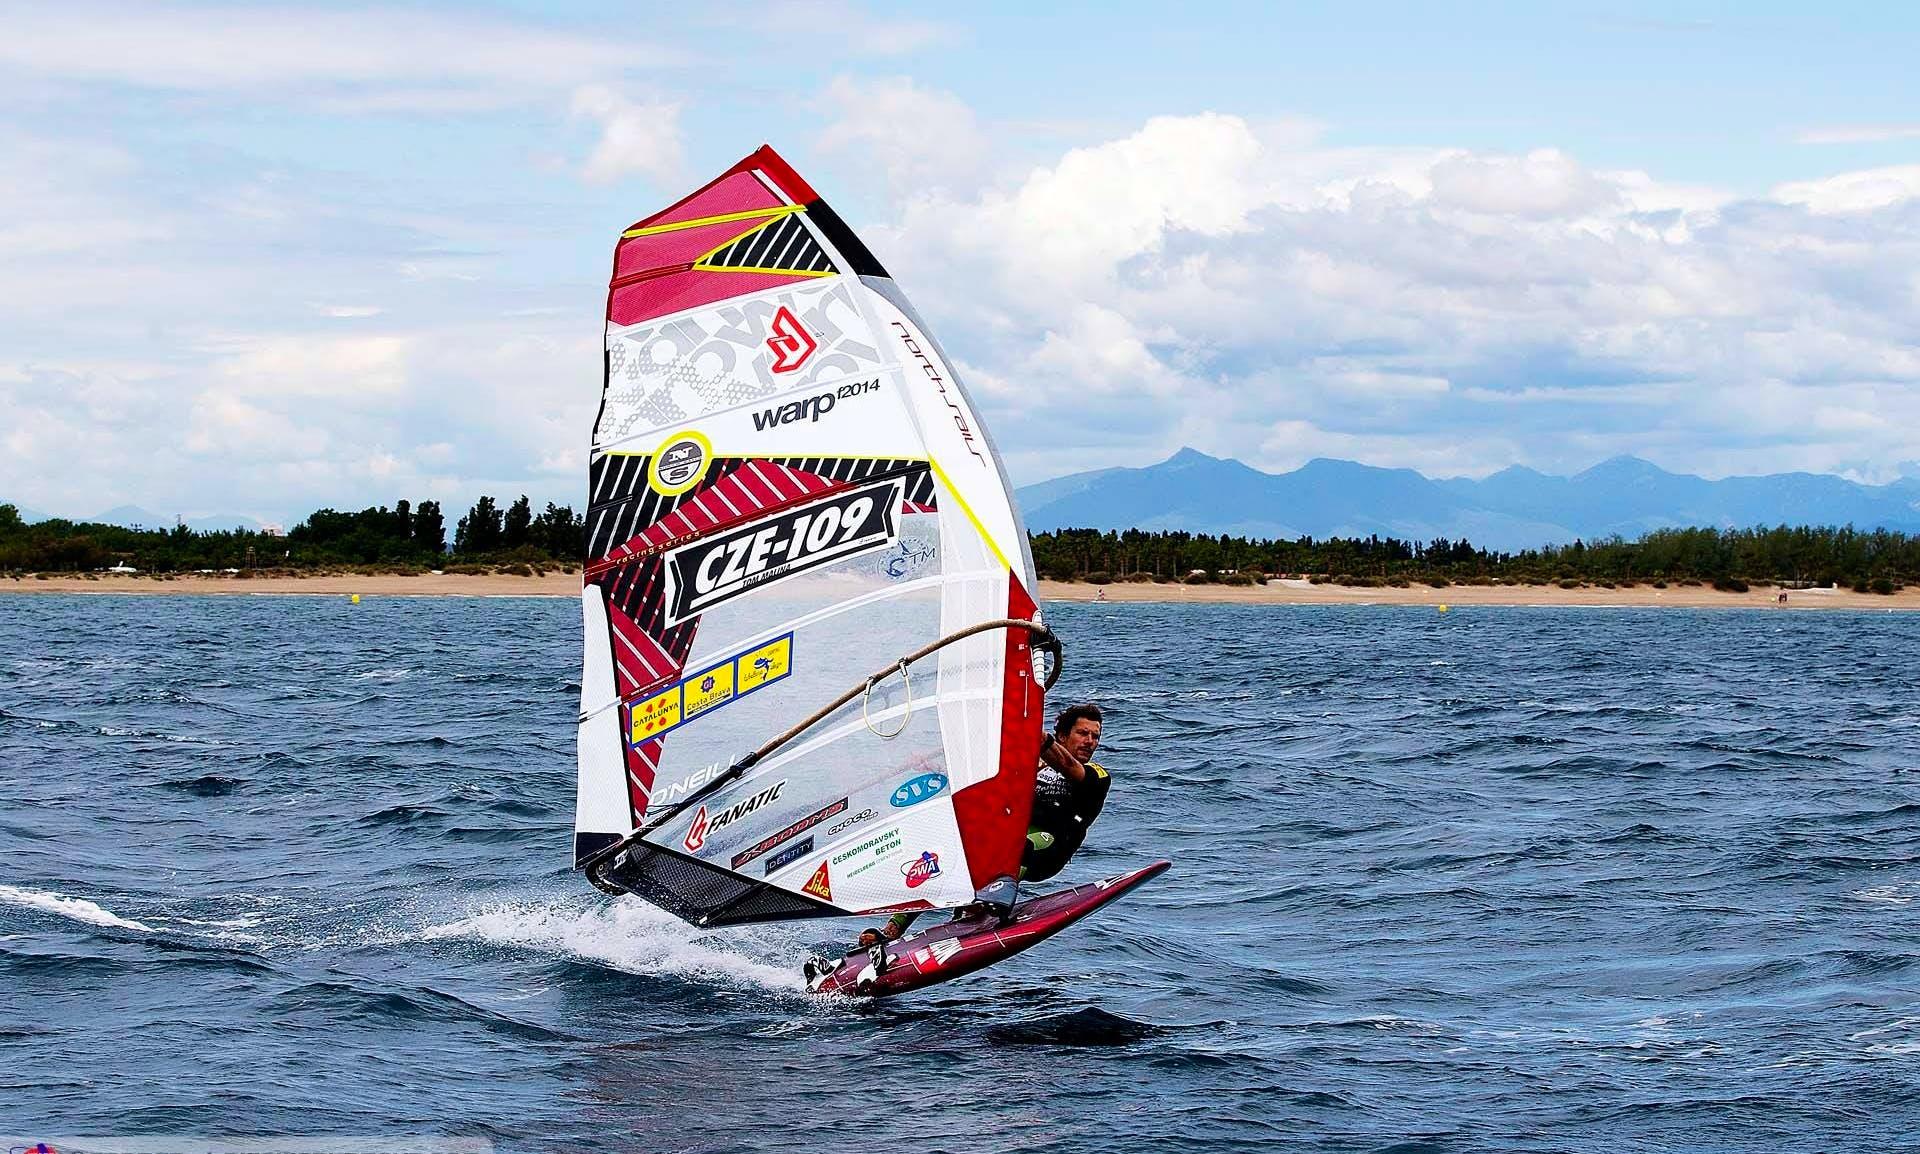 Enjoy Windsurf Rental and Courses in Chbany, Czech Republic